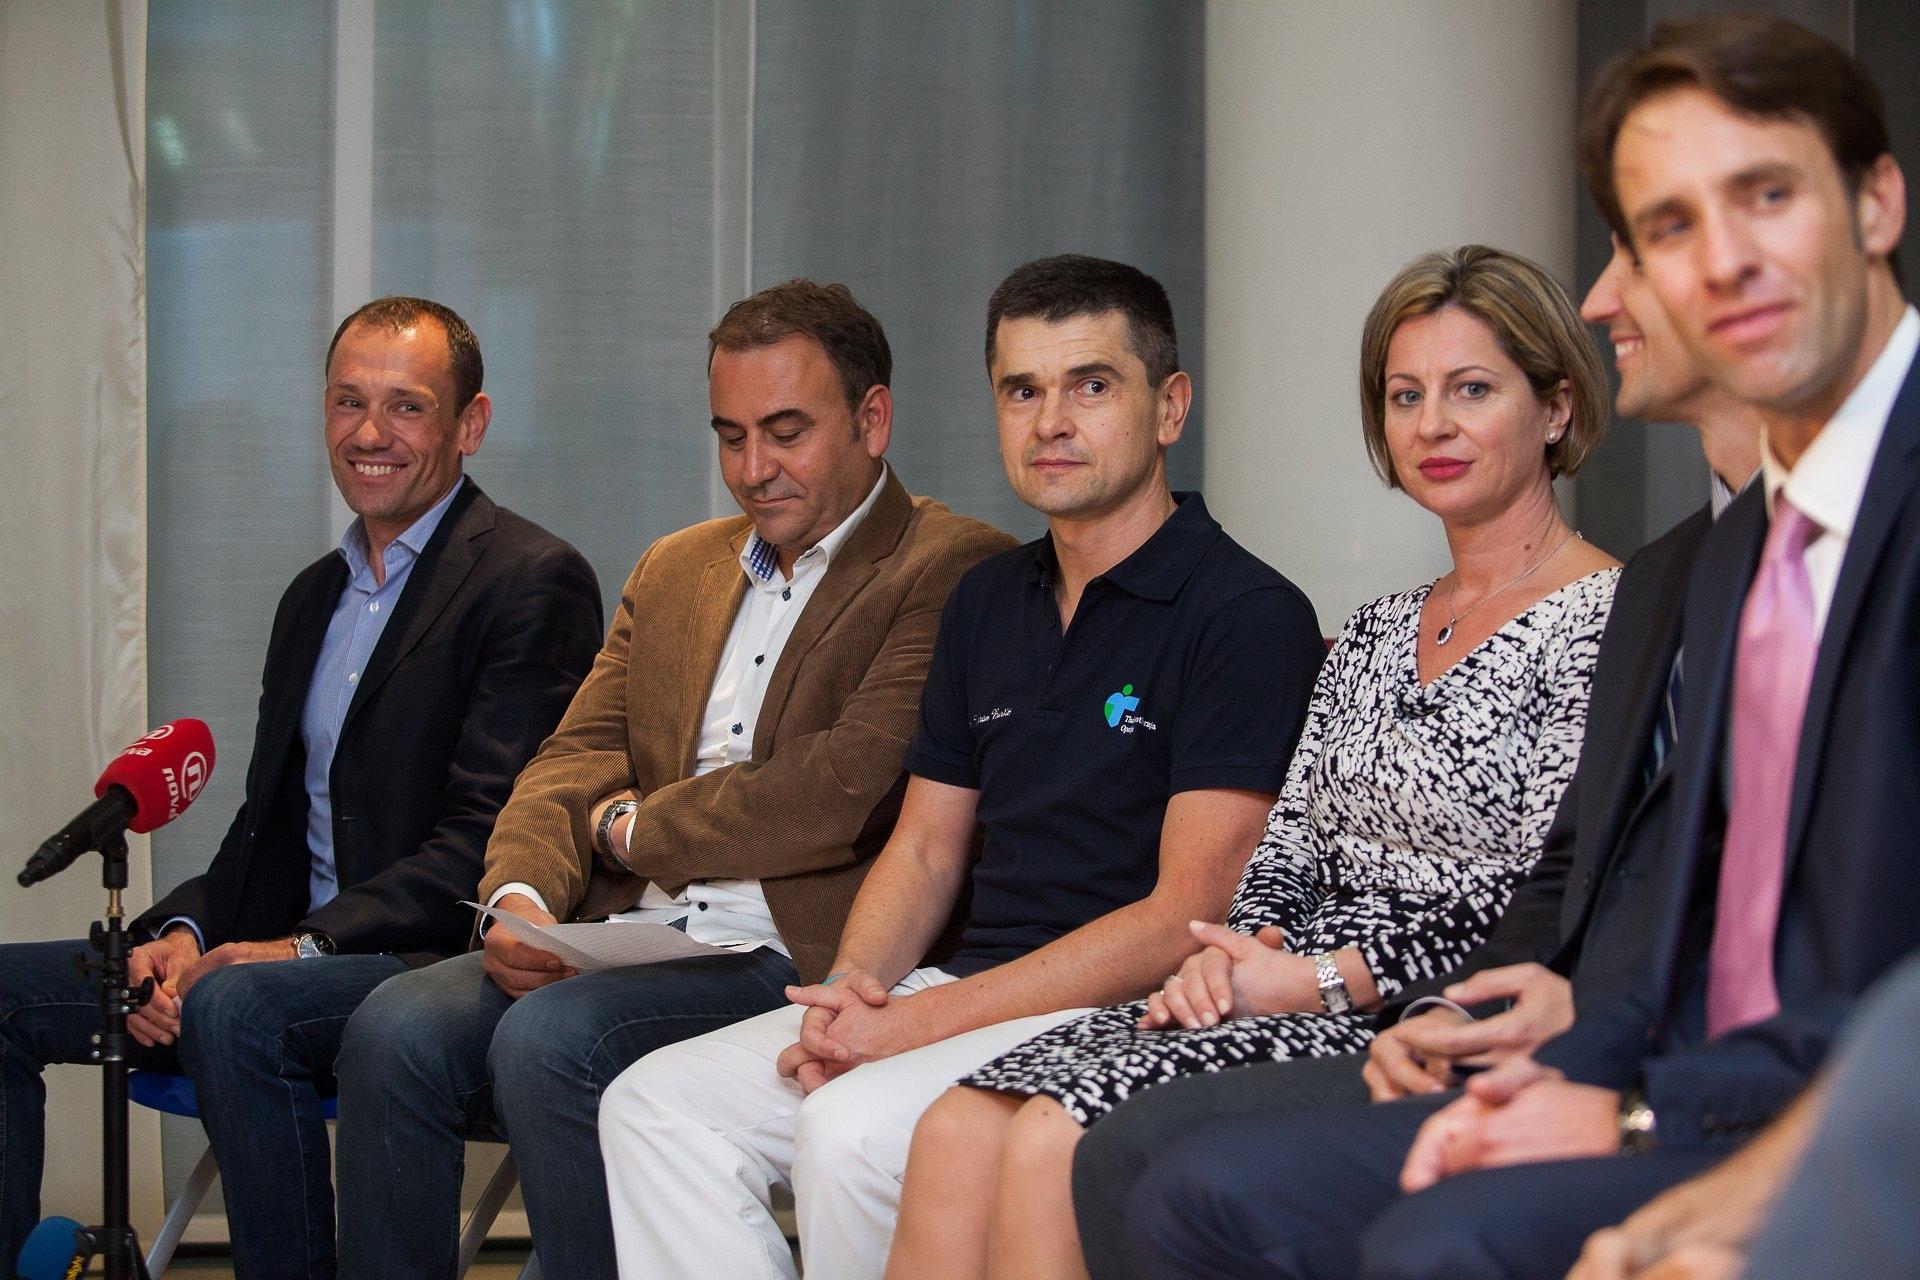 Vladimir Miholjević, Viktor Peršić, Vedran Buršić, Irena Peršić Živadinov i ostali govonici na press konferenciji u klinici Thalassotherapia Opatija